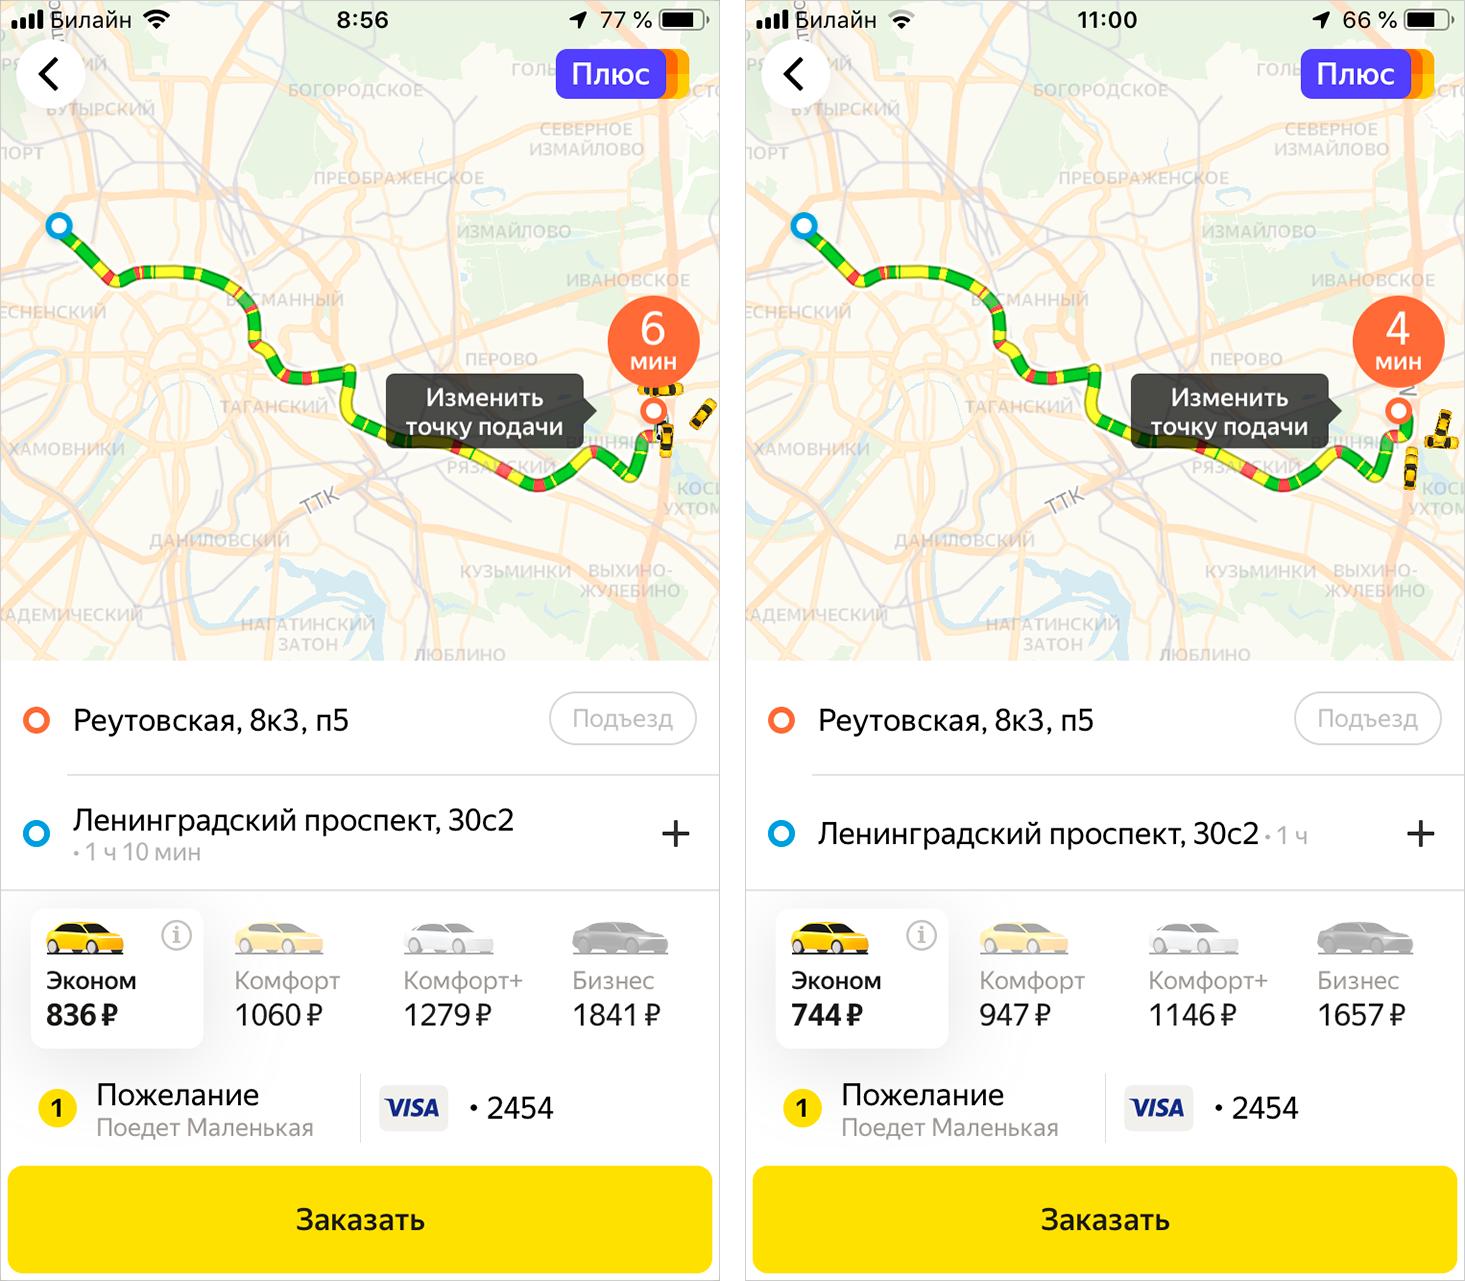 Между стоимостью двух поездок по одинаковому маршруту разница два часа и 100<span class=ruble>Р</span>